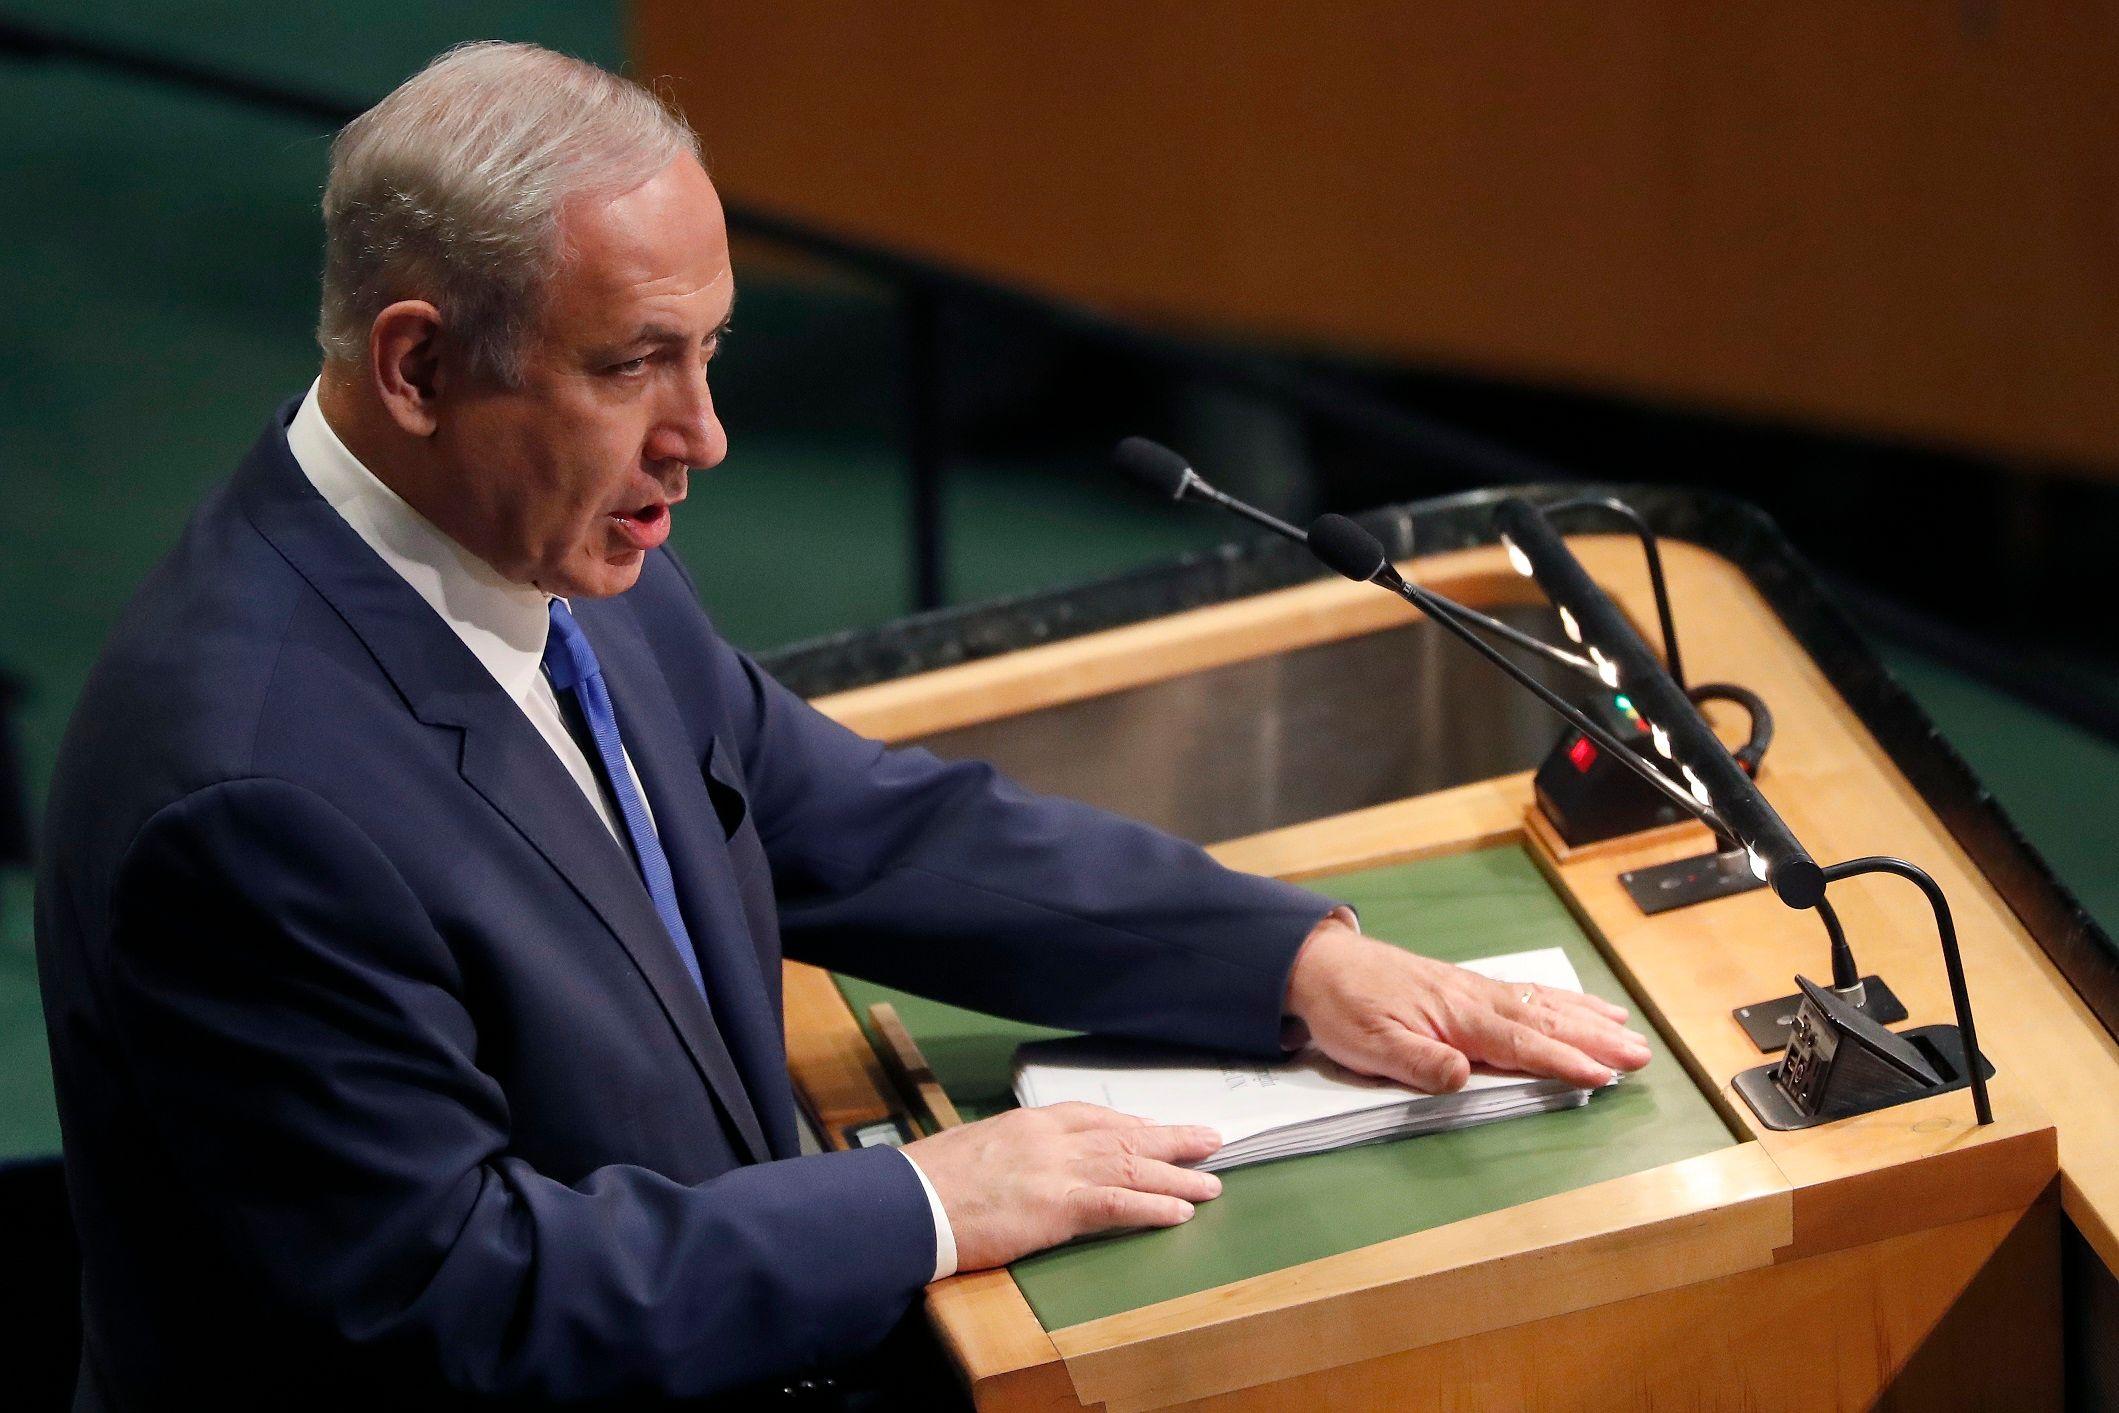 Trump says giving Mideast peace 'an absolute go'